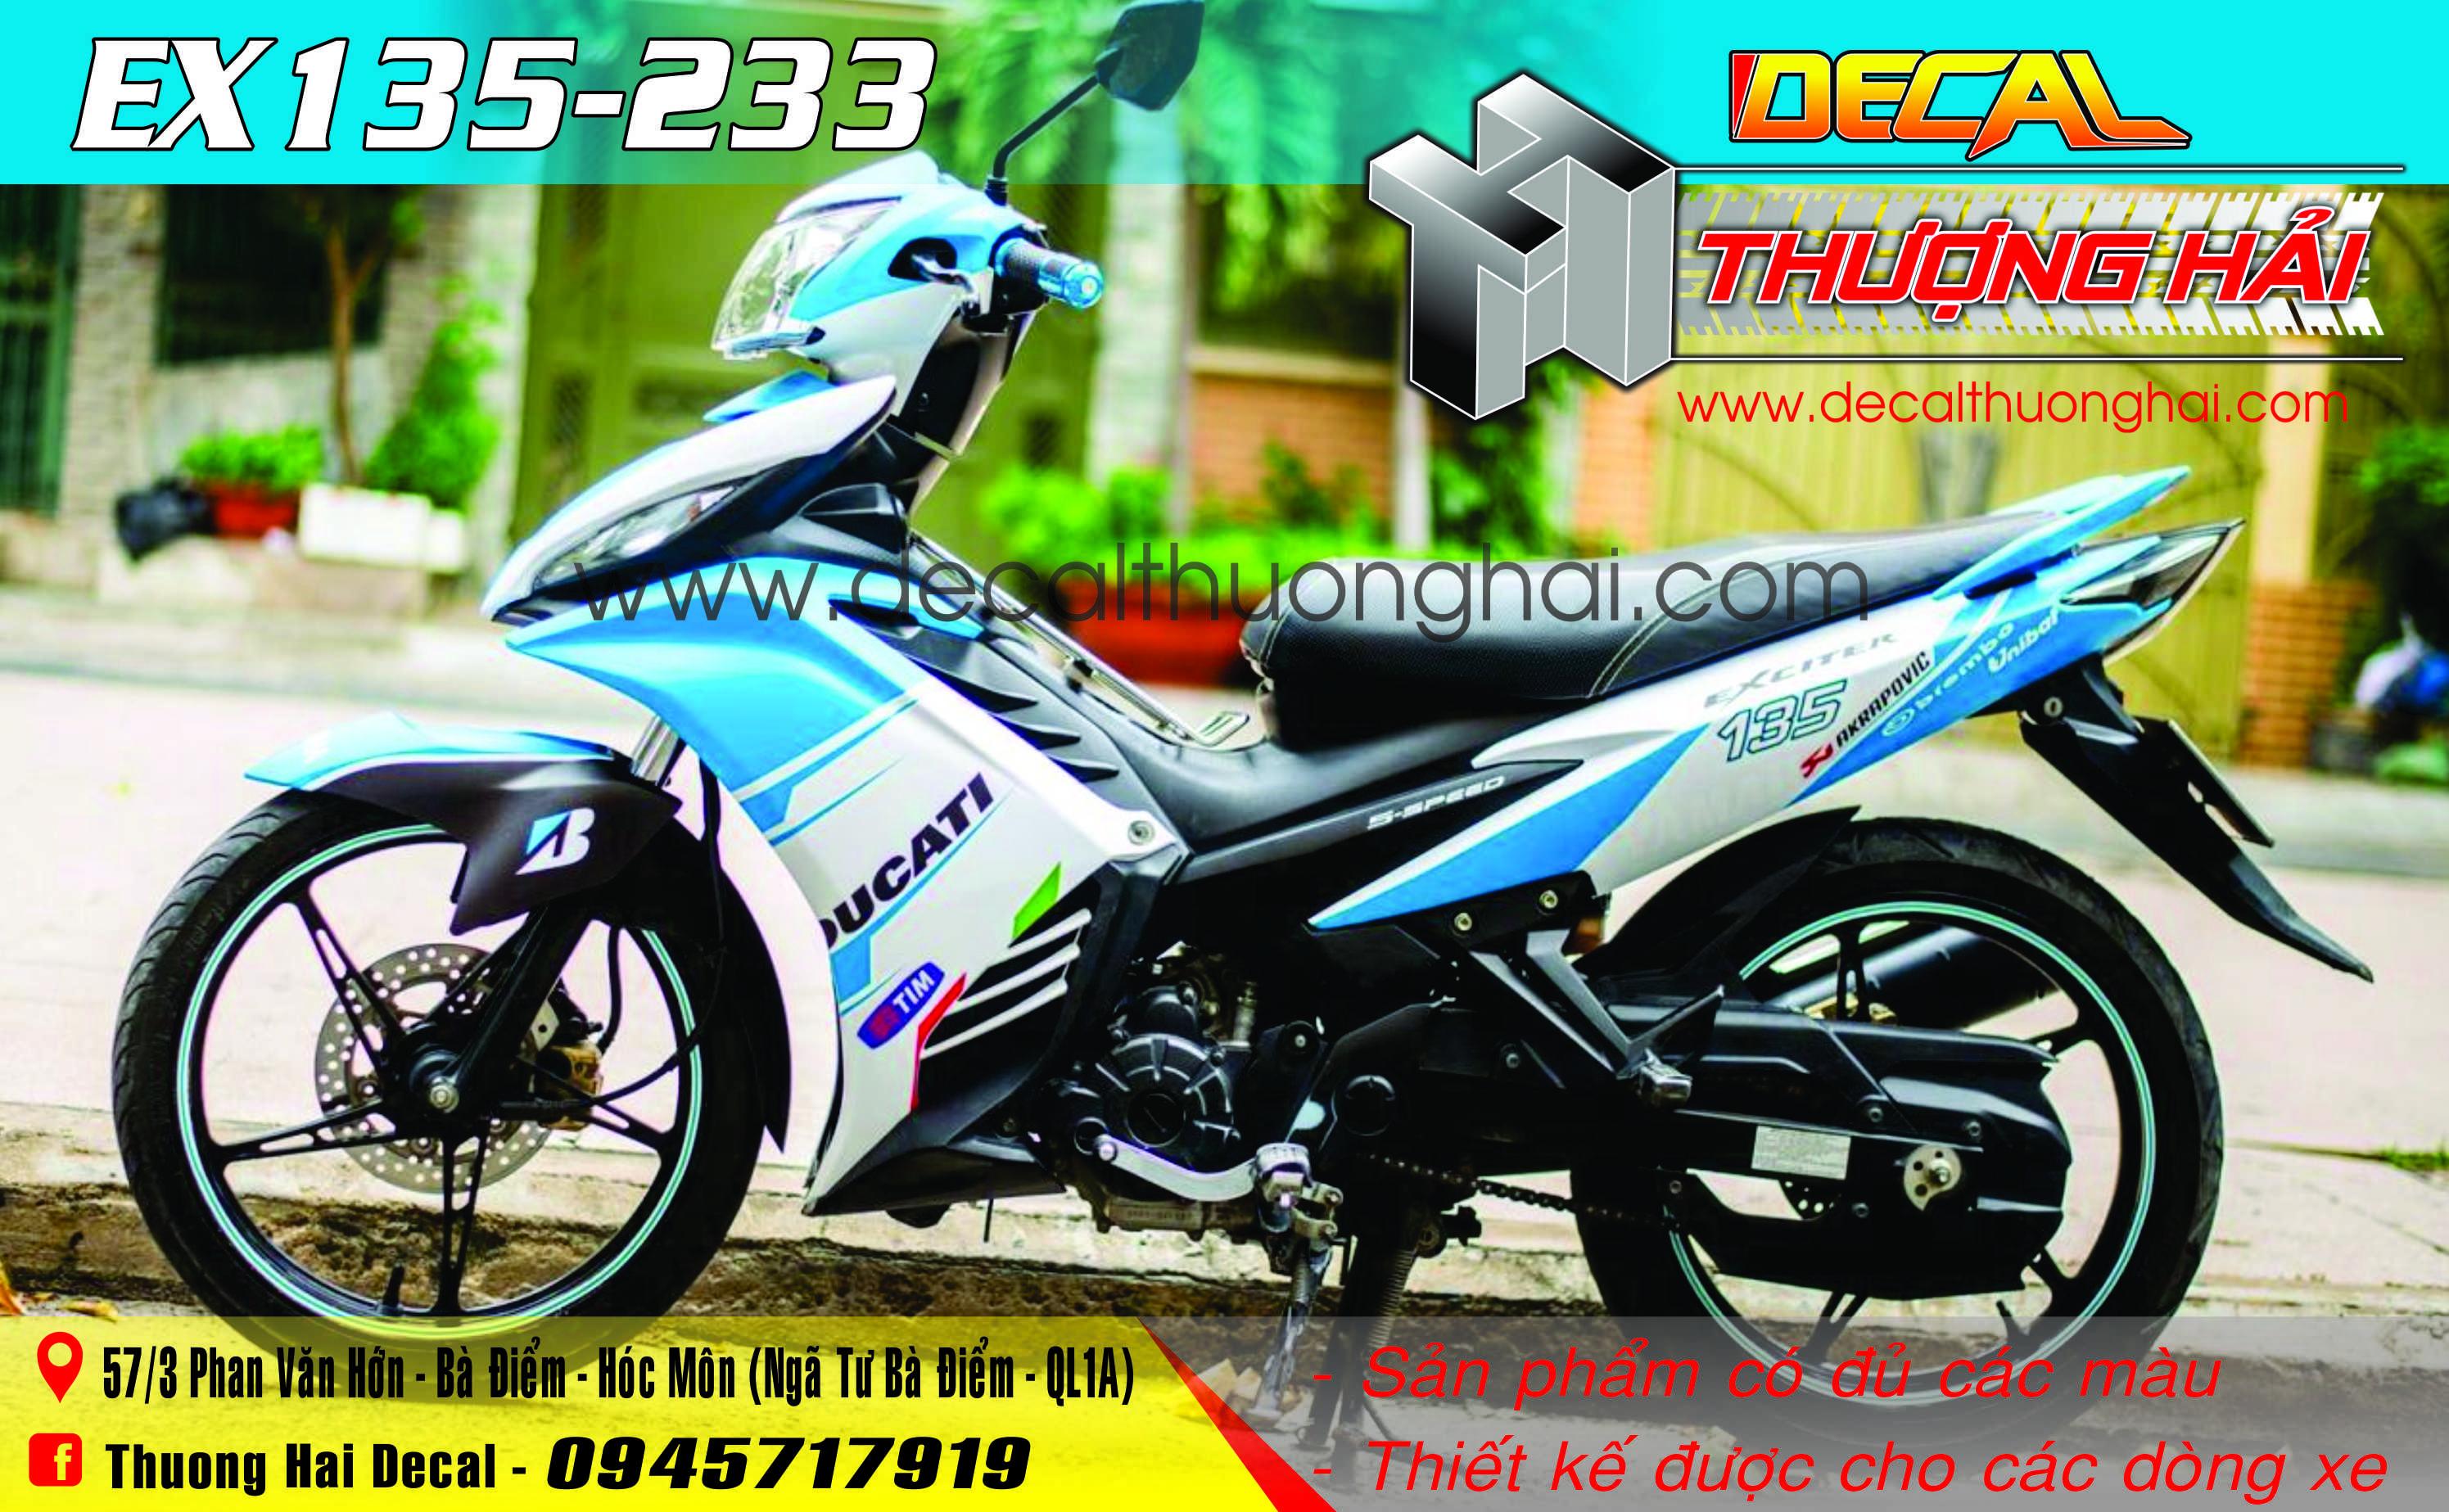 Tem Xe Exciter 135 Trắng Xanh Ducati - 233